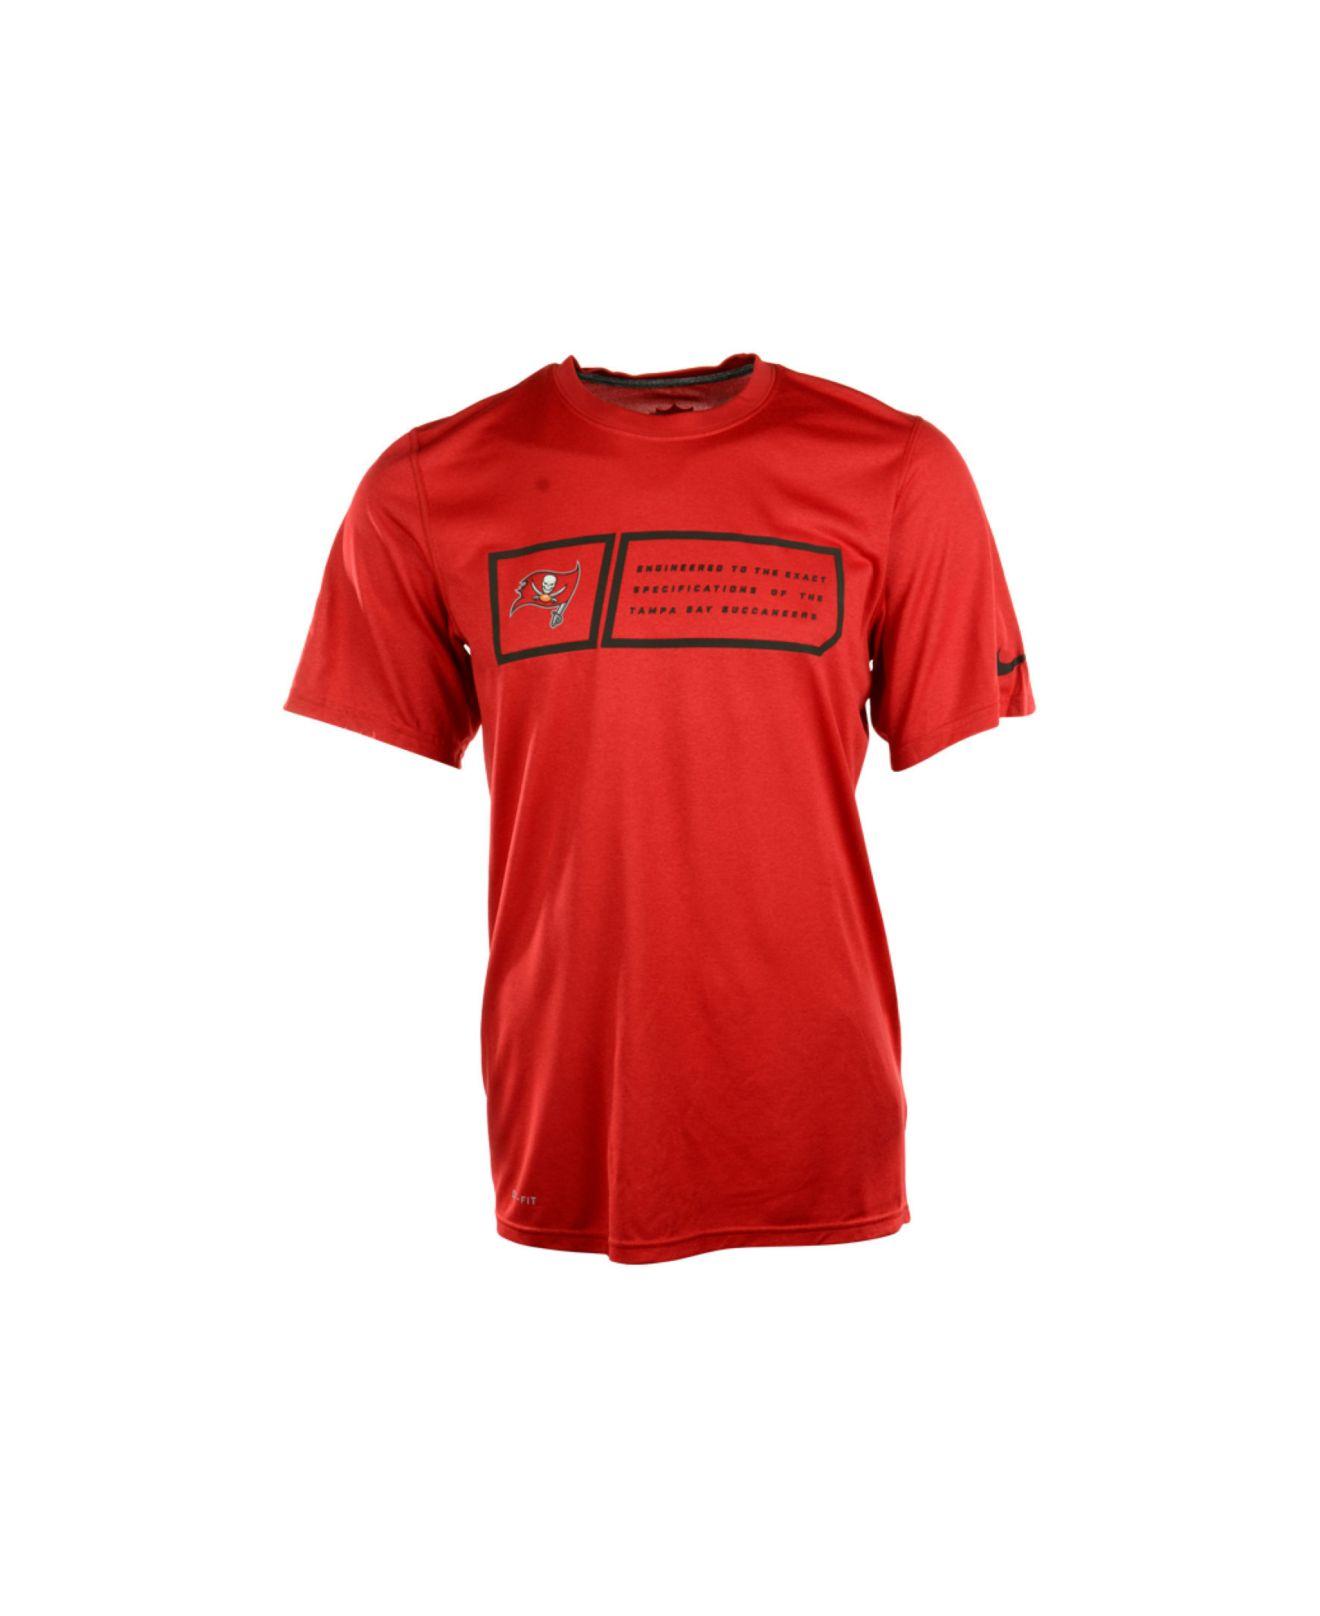 Nike men 39 s short sleeve tampa bay buccaneers dri fit t for Dri fit t shirt design